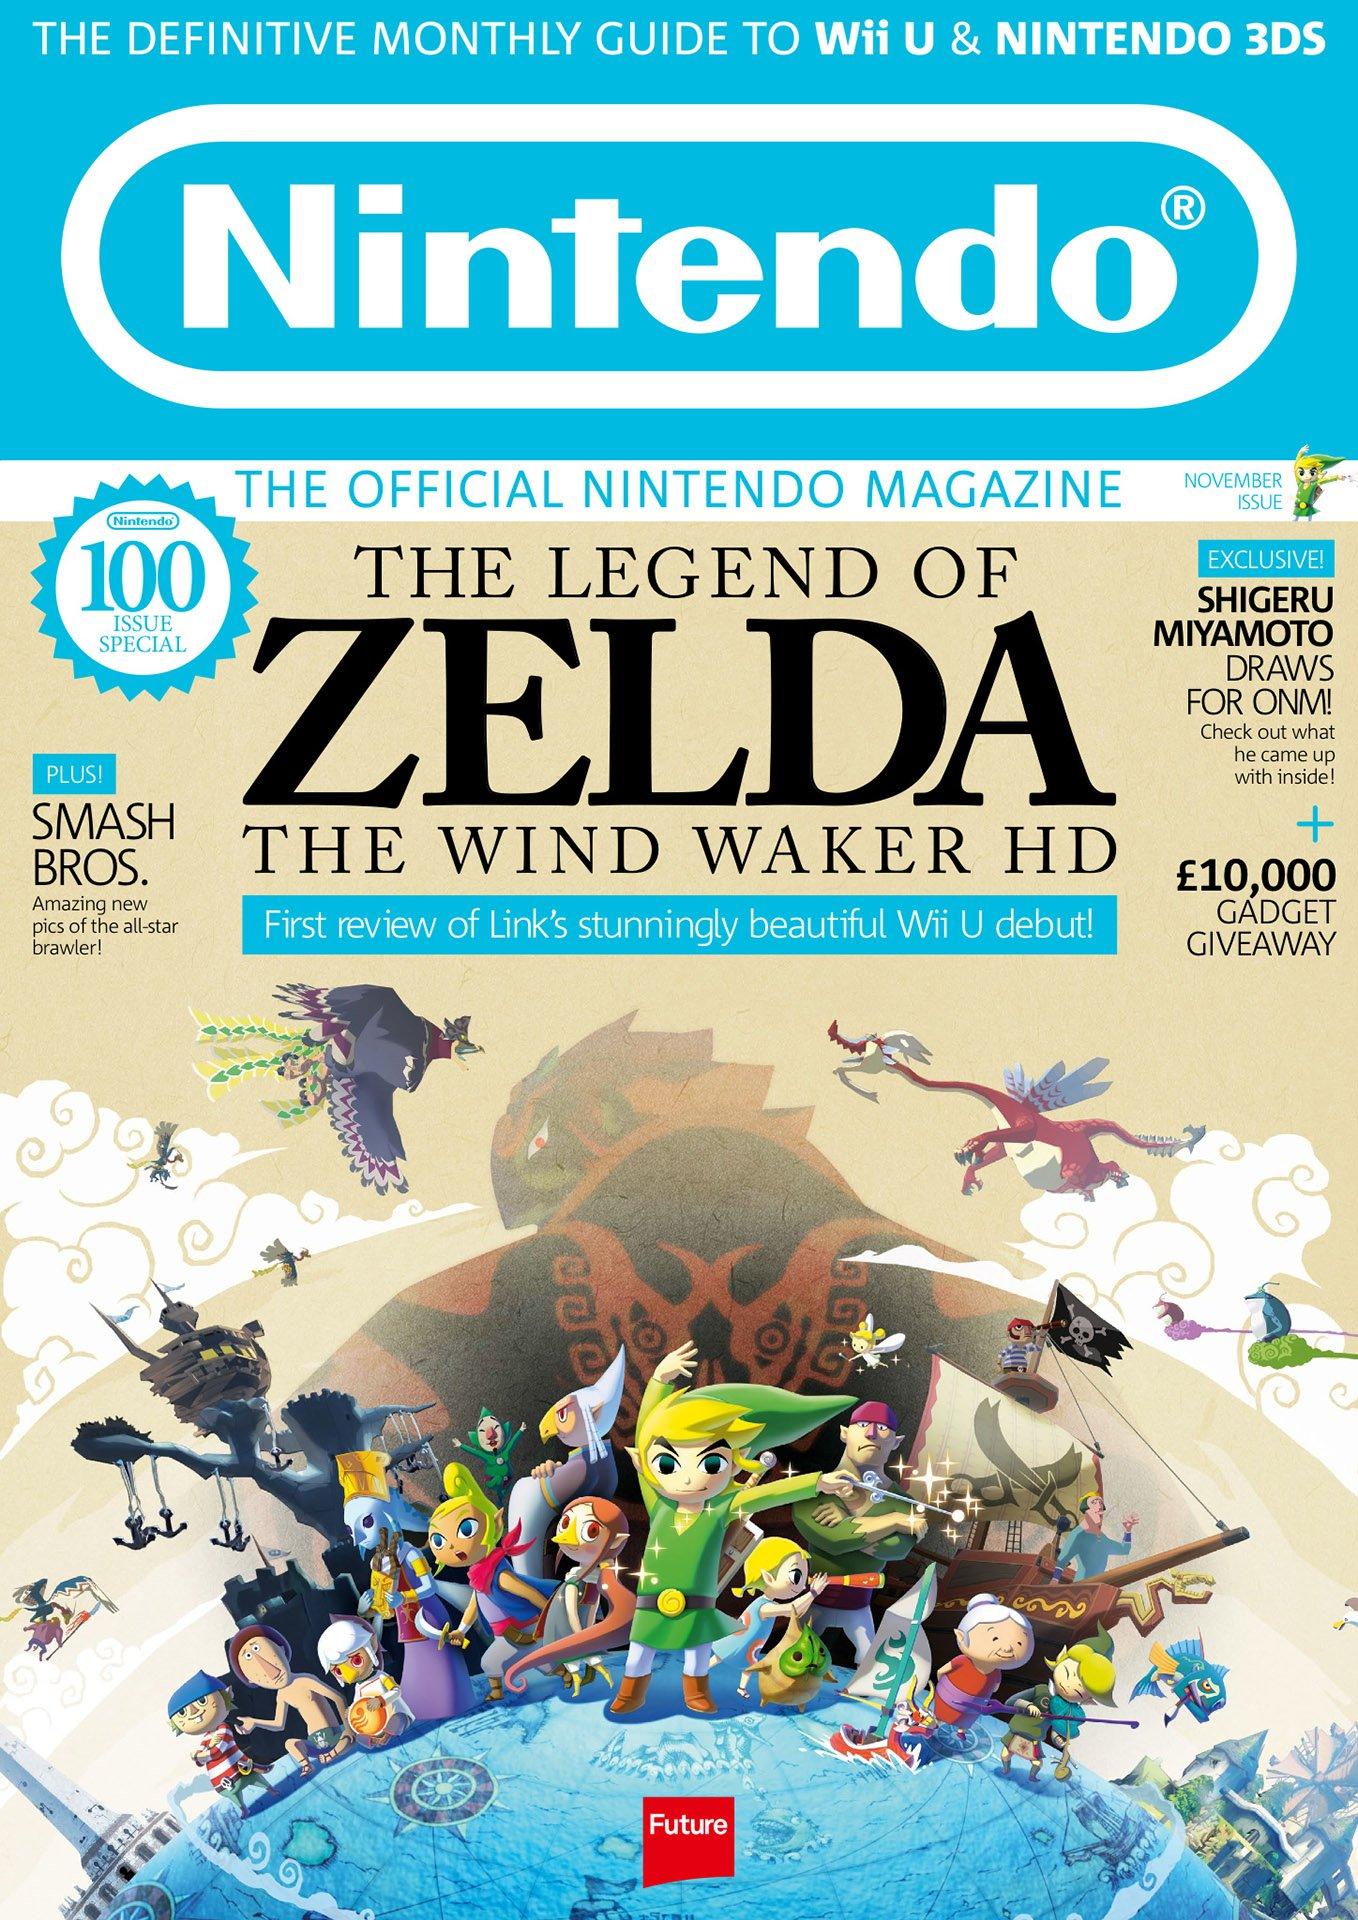 Official Nintendo Magazine 100 (November 2013)